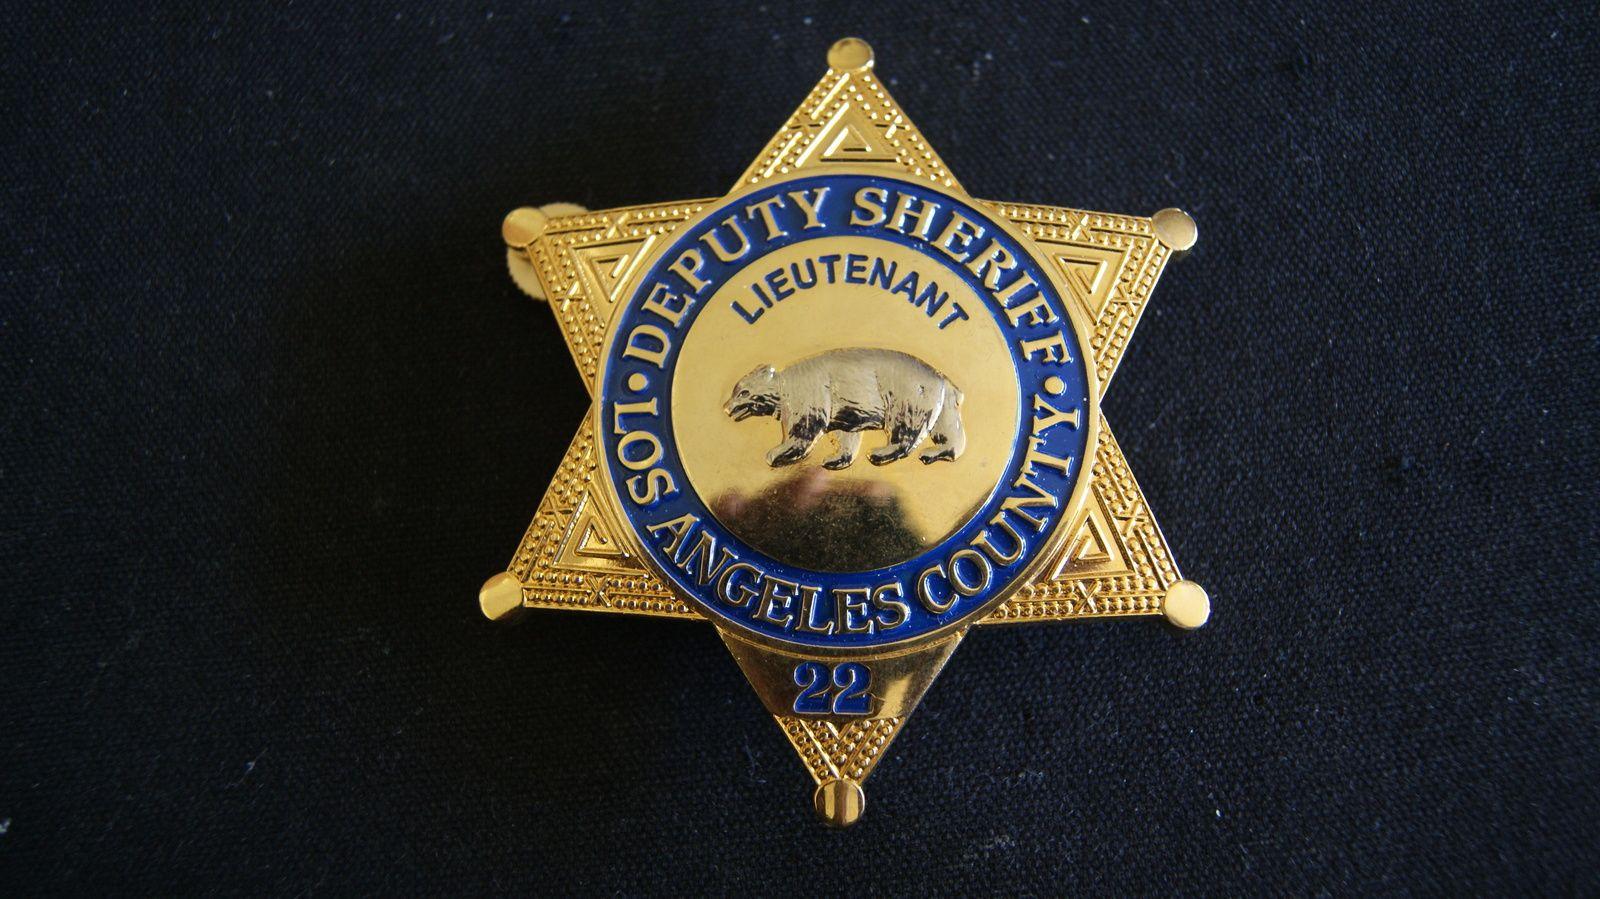 La County Sheriff S Department Lieutenants Badge La County Sheriff Badge County Sheriffs